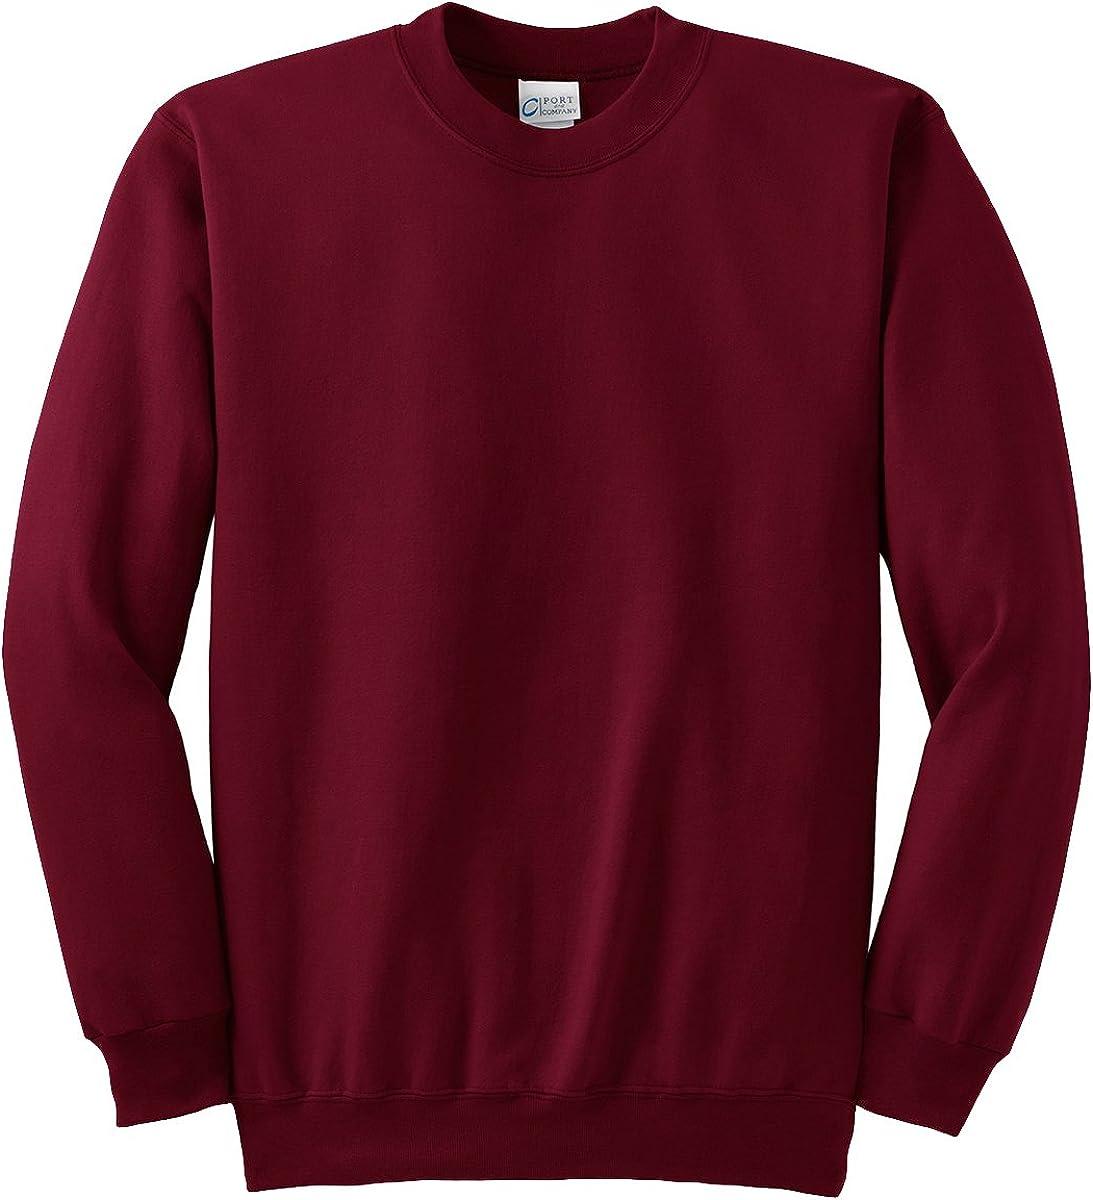 Port & Company Tall Ultimate Crewneck Sweatshirt. PC90T XX-Large Tall Athletic Heather